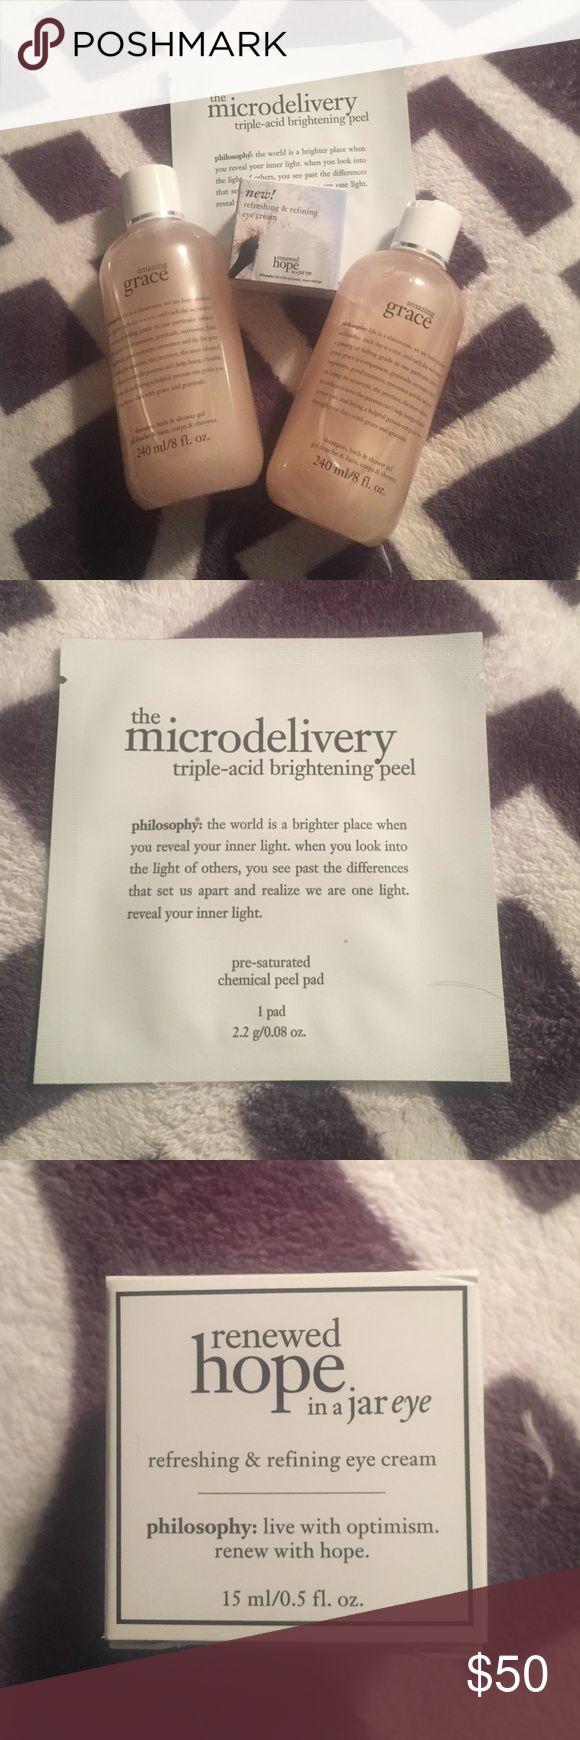 mas de 25 ideas increibles sobre peeling duschgel en pinterest philosophy grab bag 2 amazing grace shower gel renewed hope in a jar eye cream